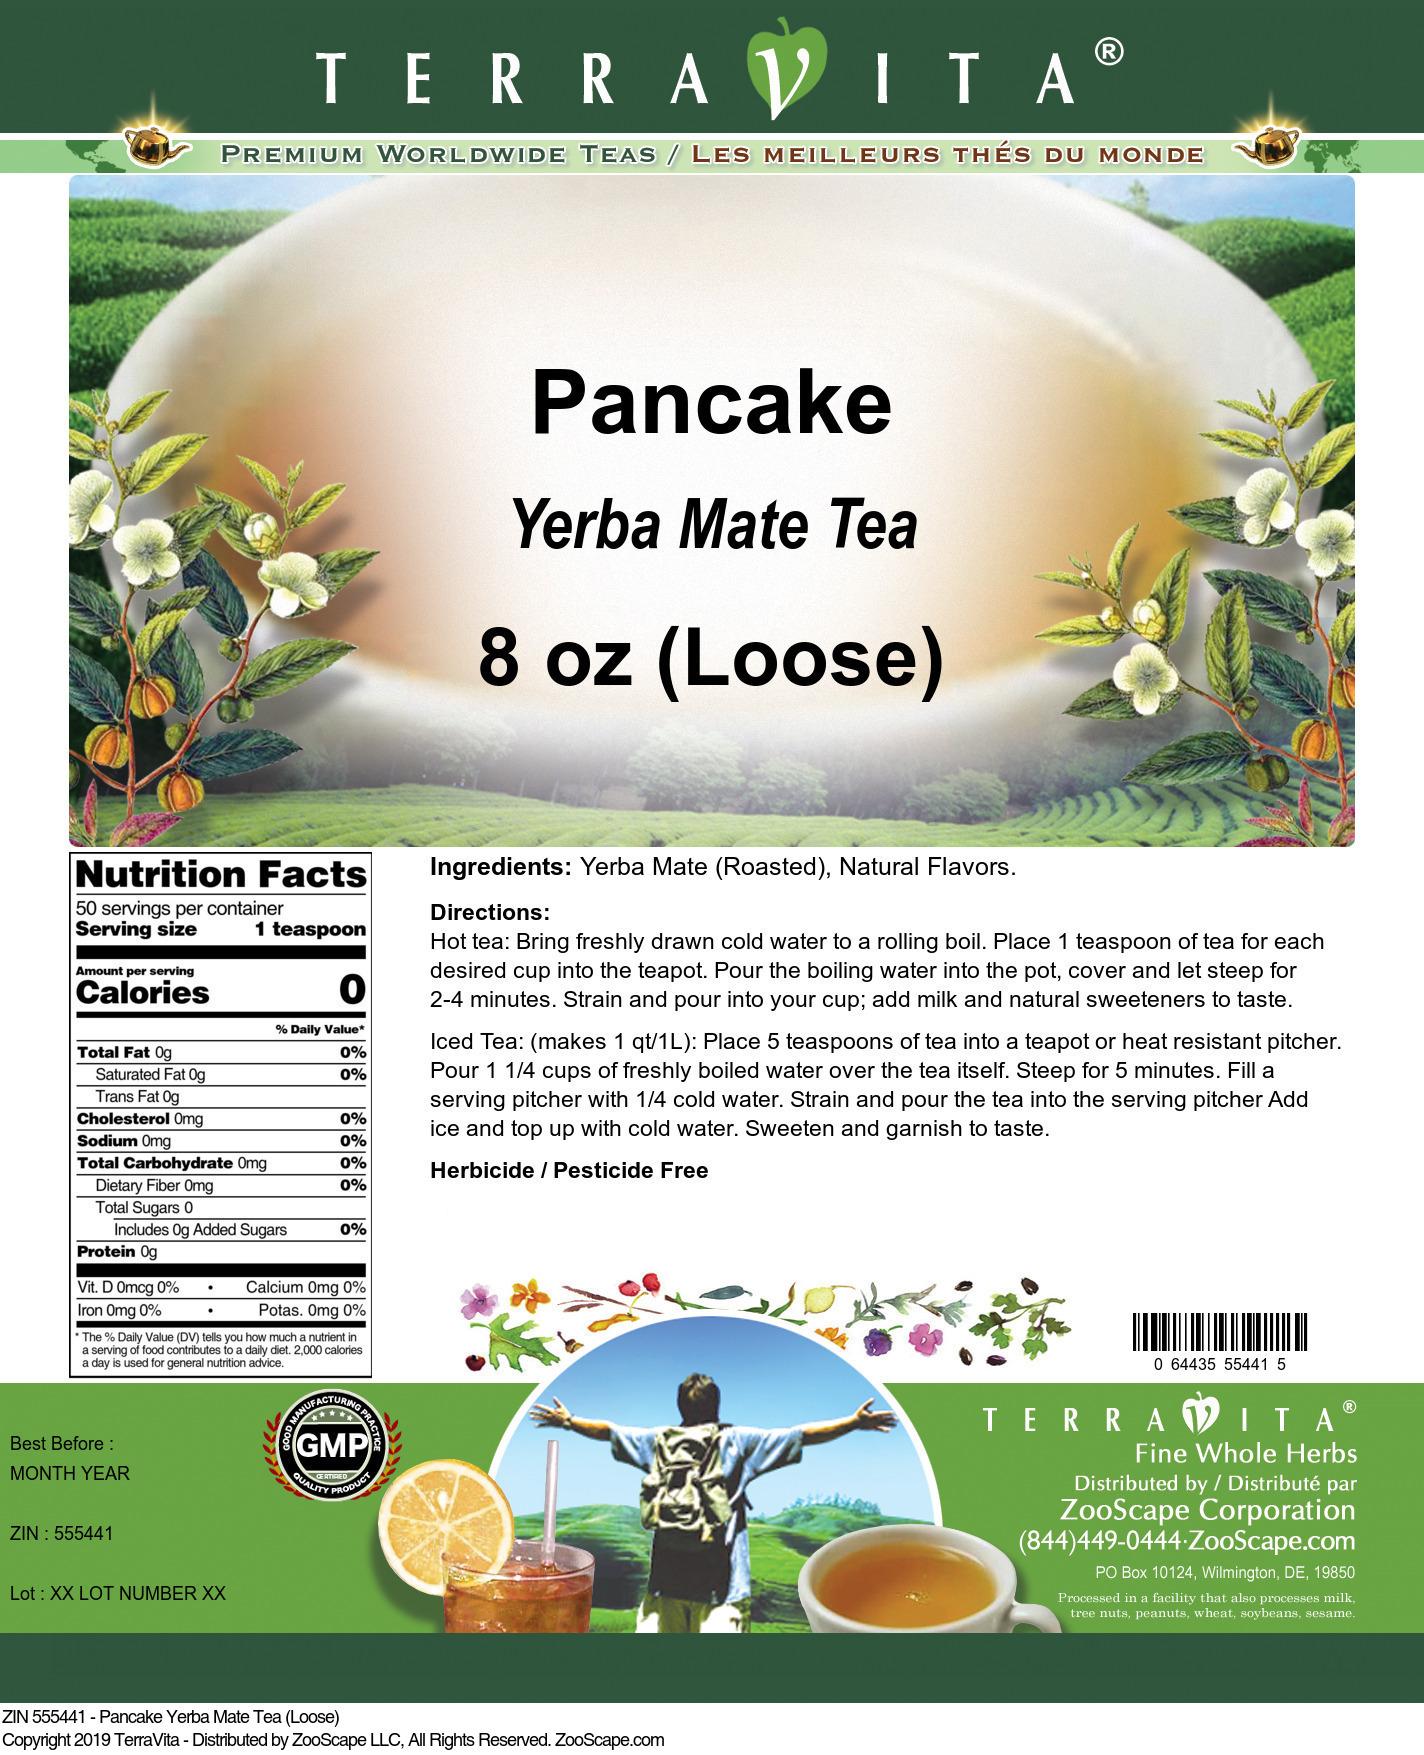 Pancake Yerba Mate